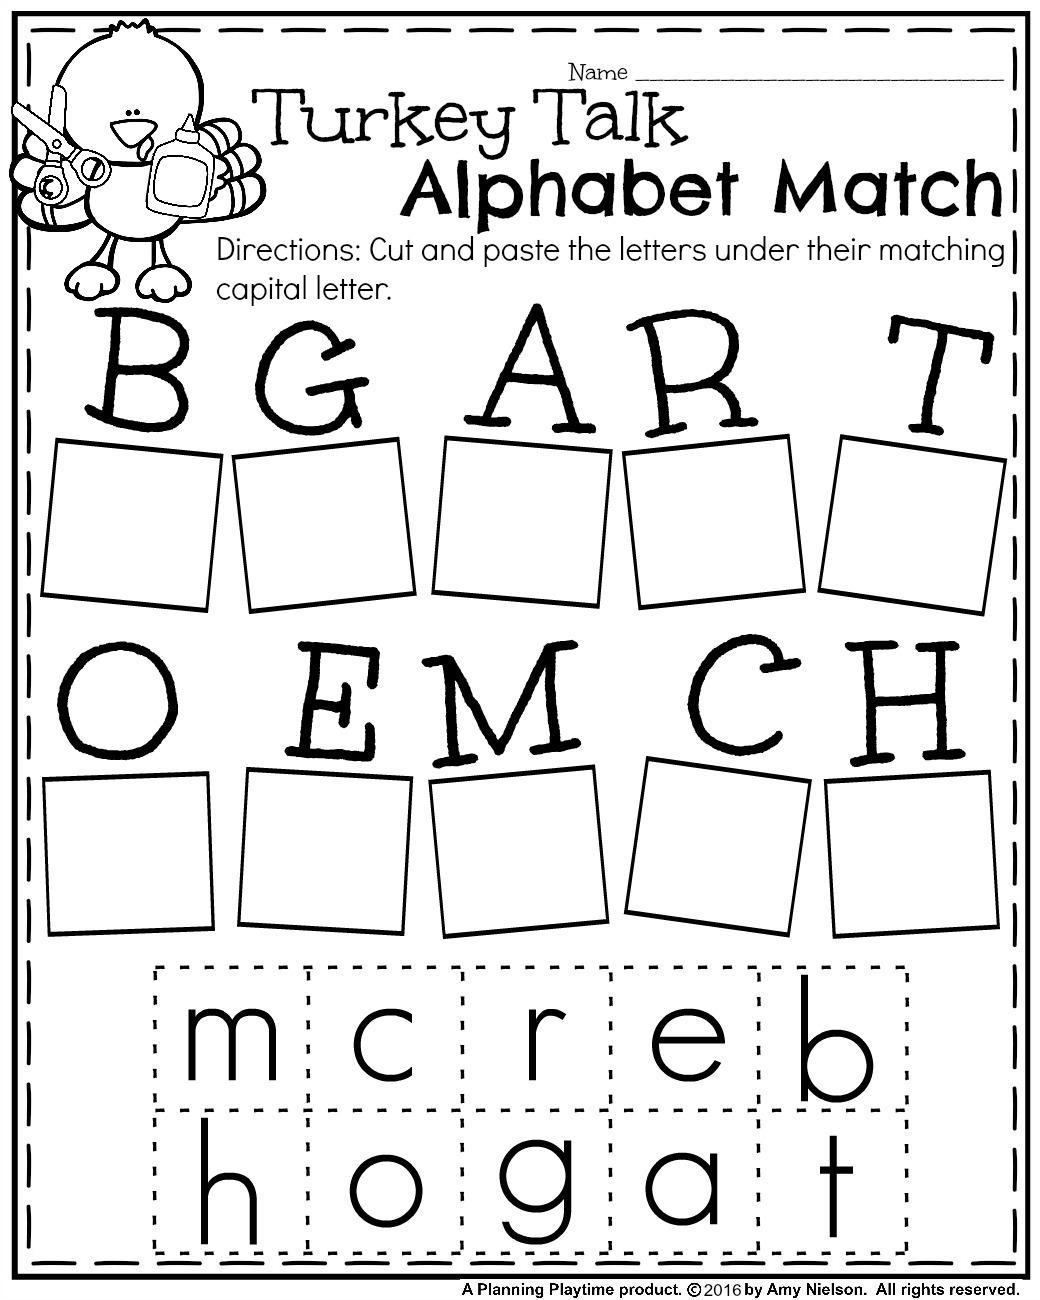 Free Printable Kindergarten Worksheets Cut And Paste Preschool Cut - Free Printable Kindergarten Worksheets Cut And Paste